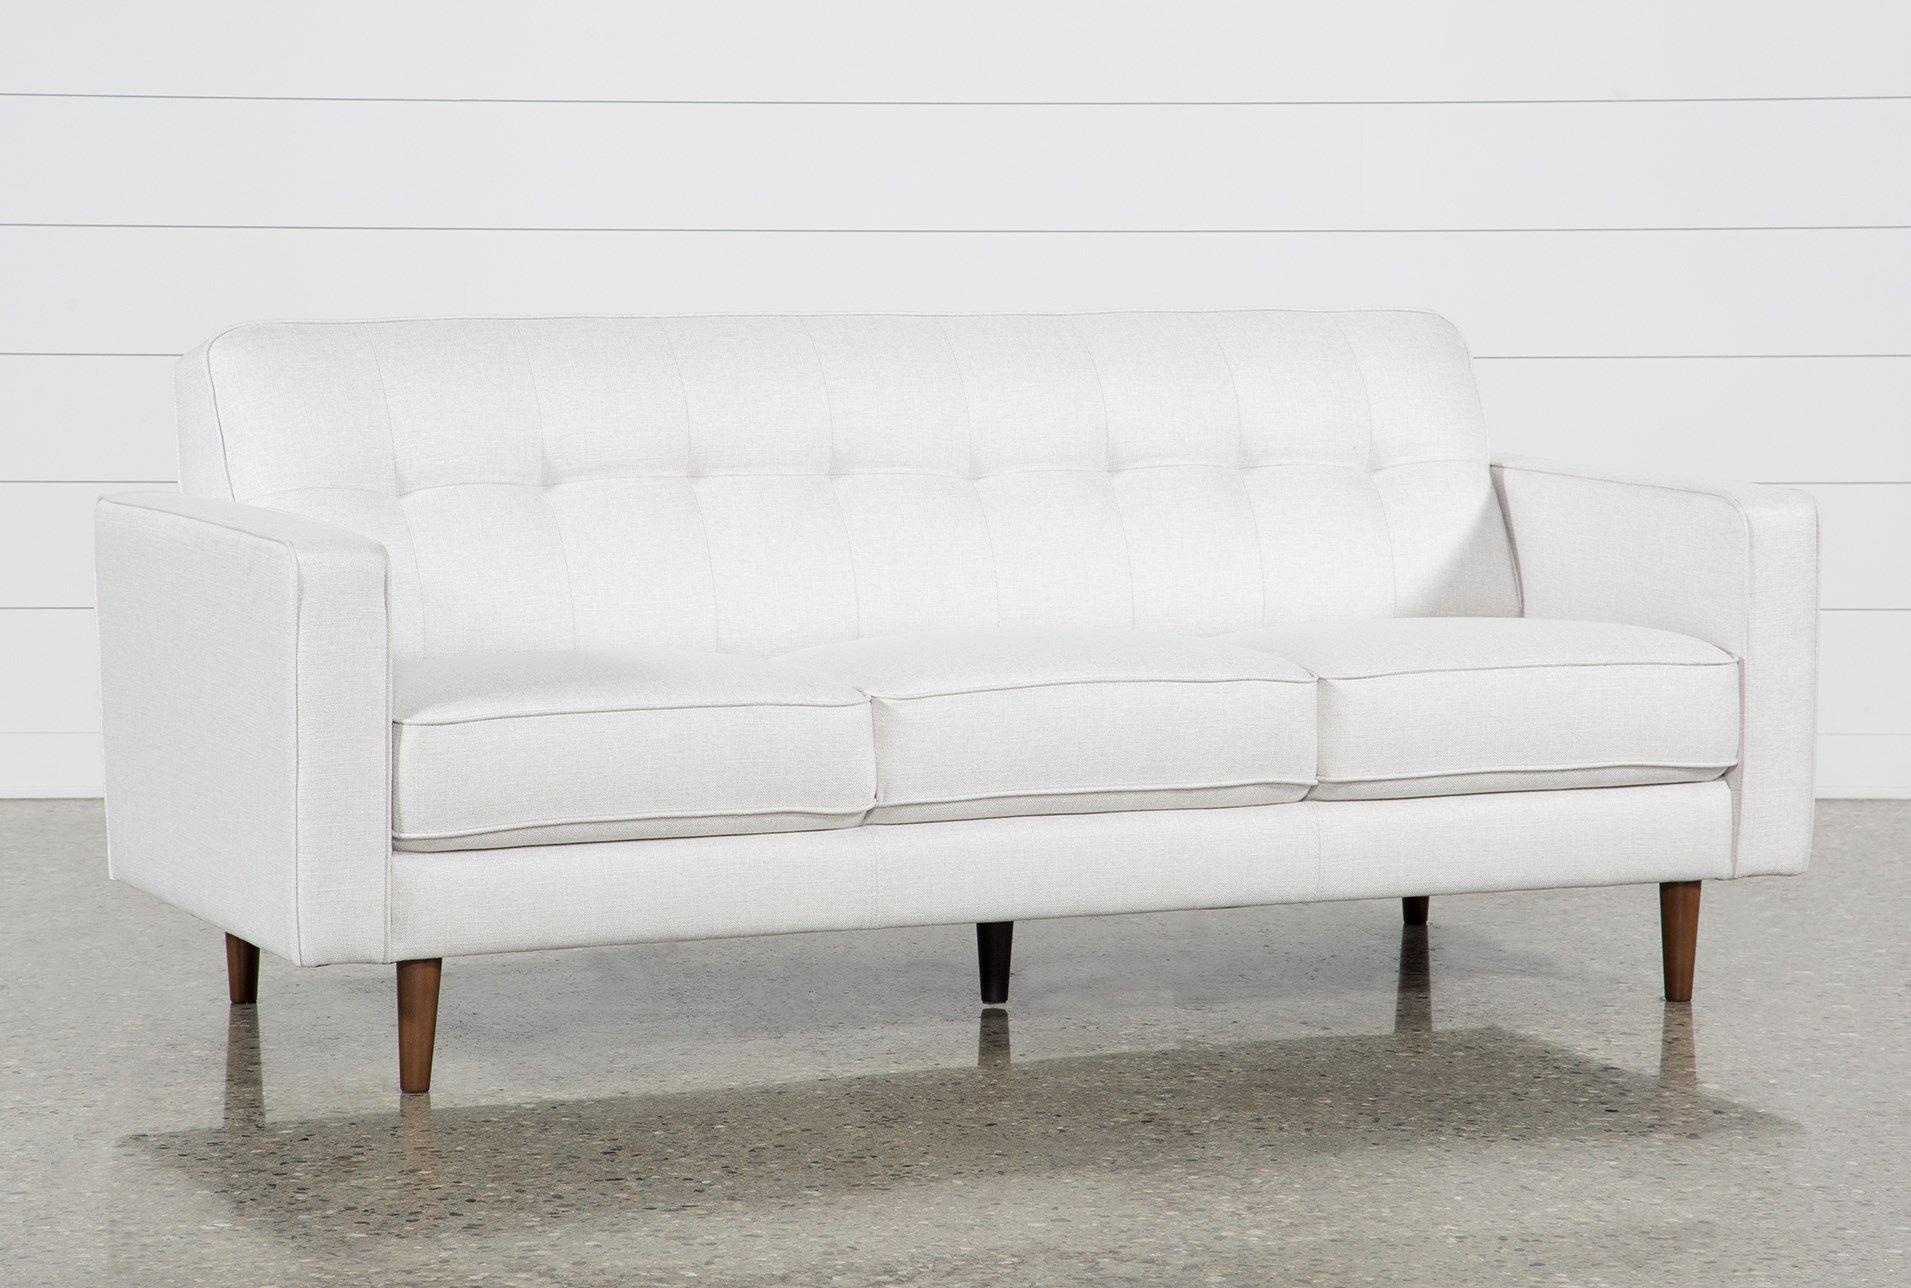 Surprising London Optical Queen Sleeper In 2019 For Our Home Sofa Machost Co Dining Chair Design Ideas Machostcouk